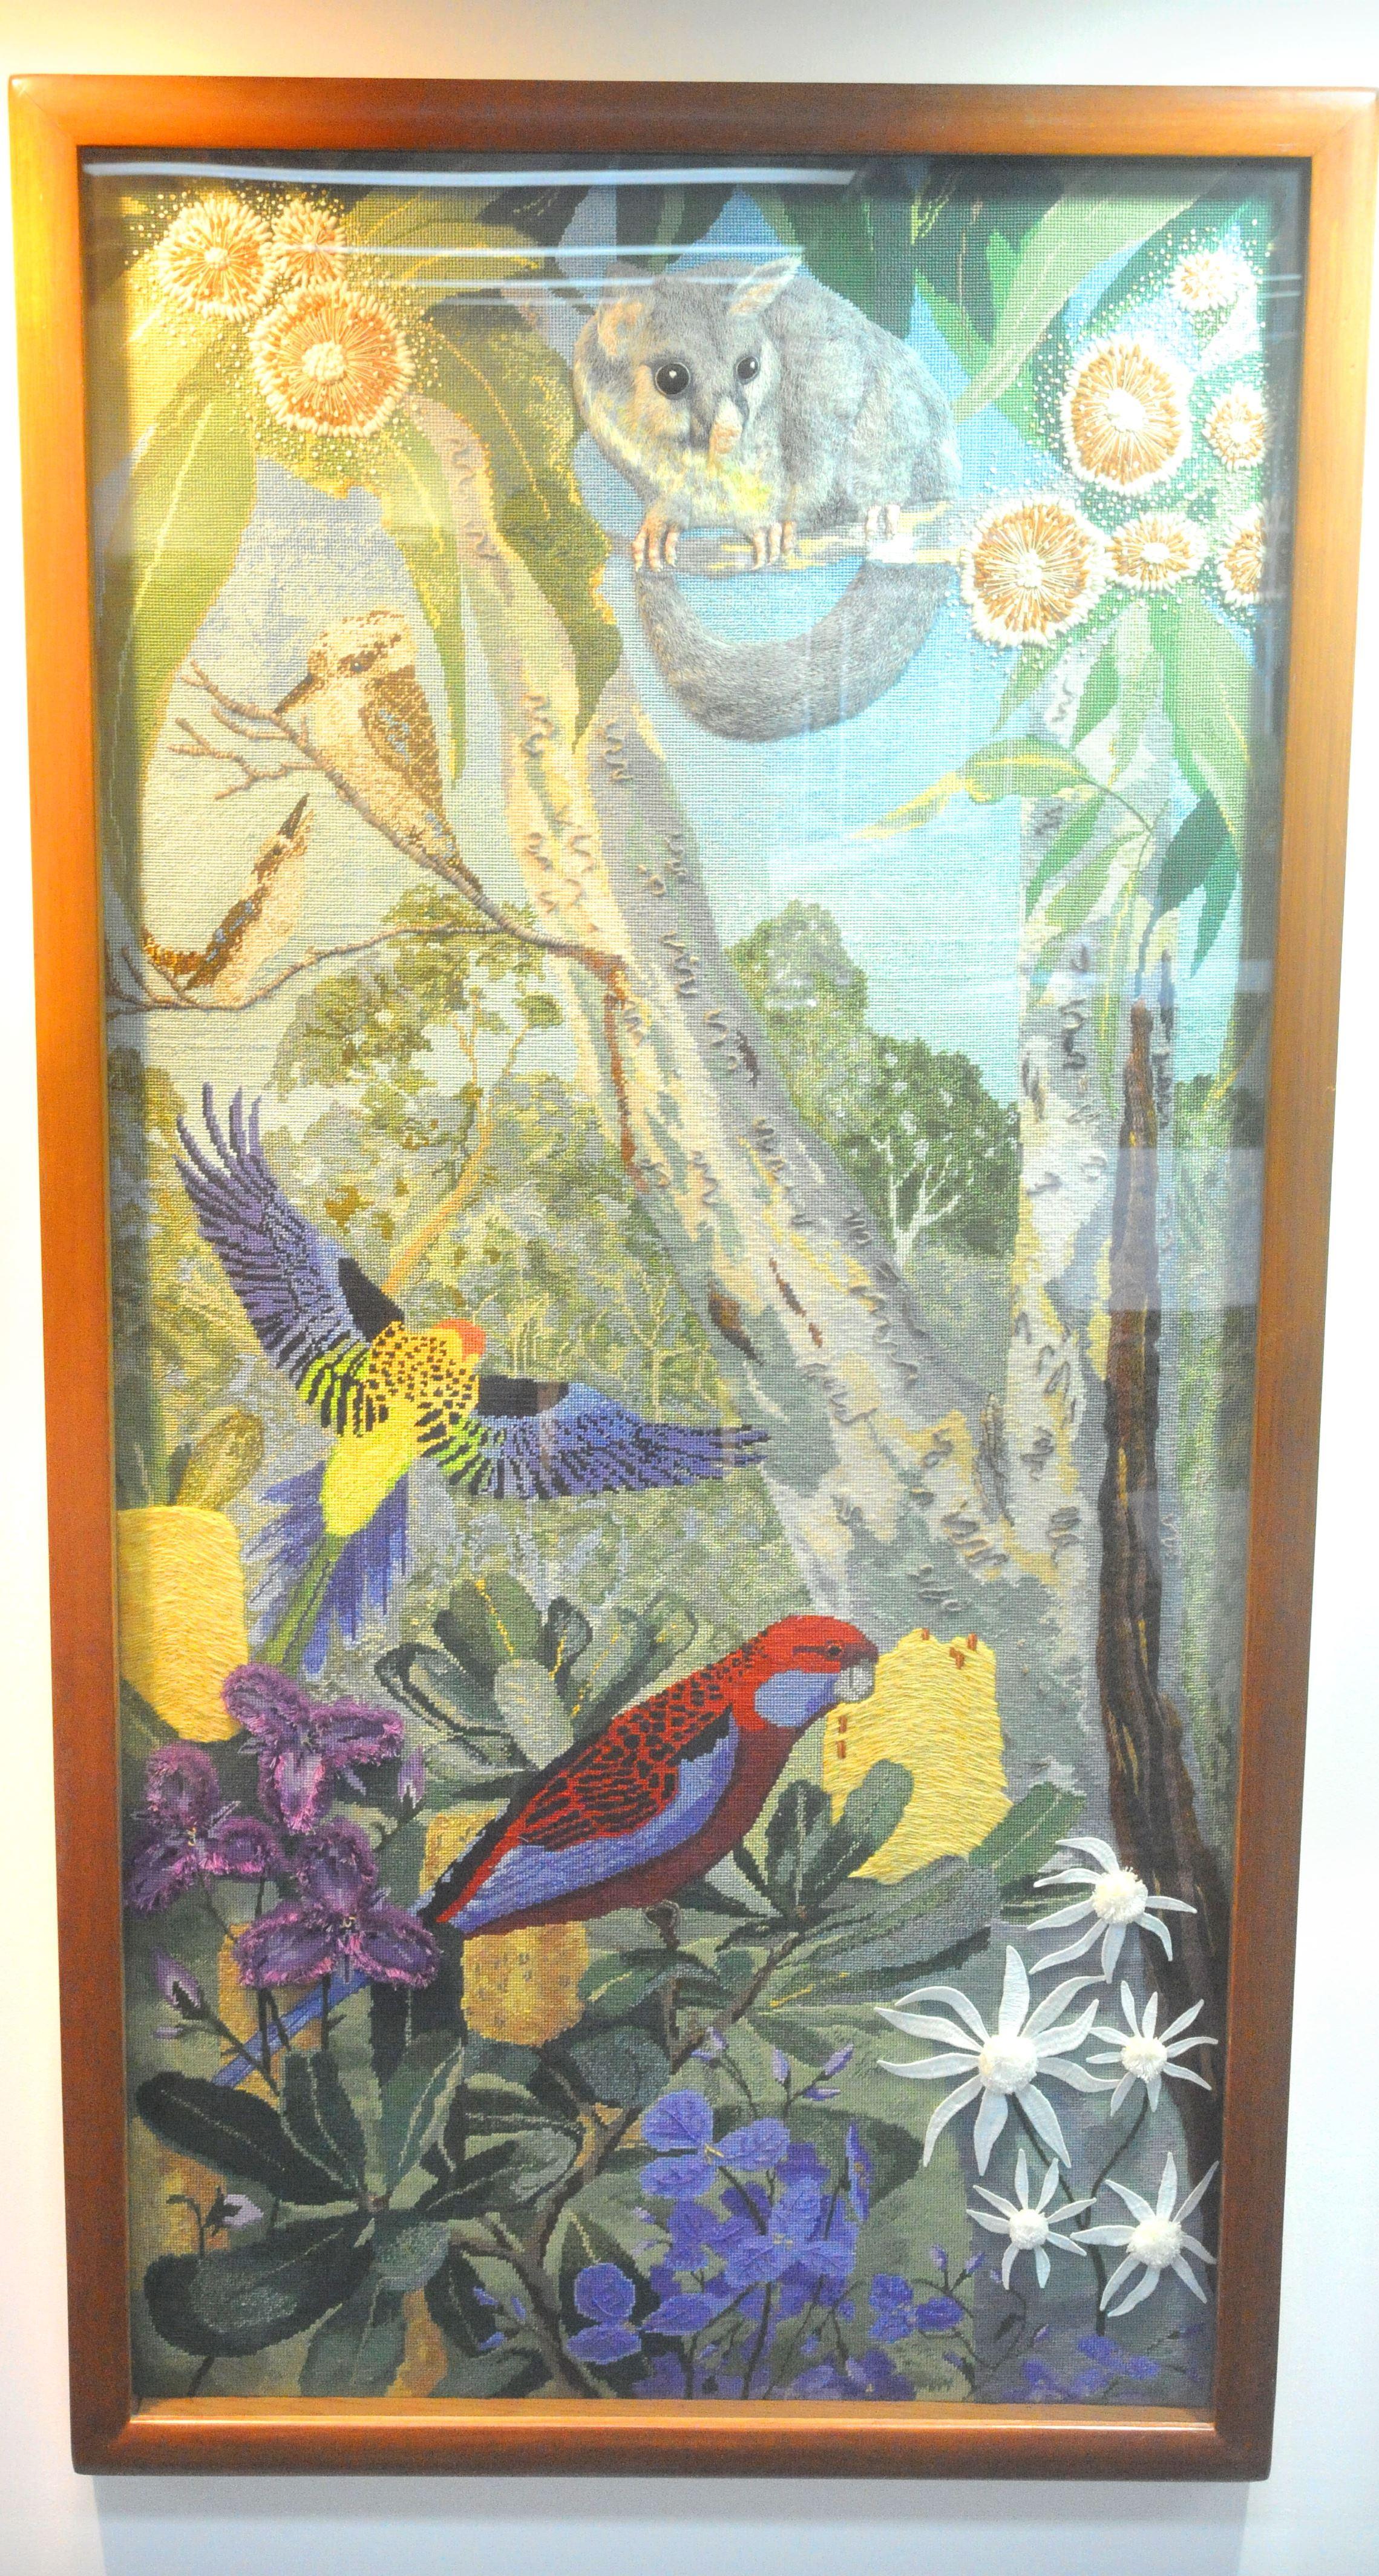 This panel features Kookaburras, Rosellas, Banksia, Brushtail Possum and Grey Gums.